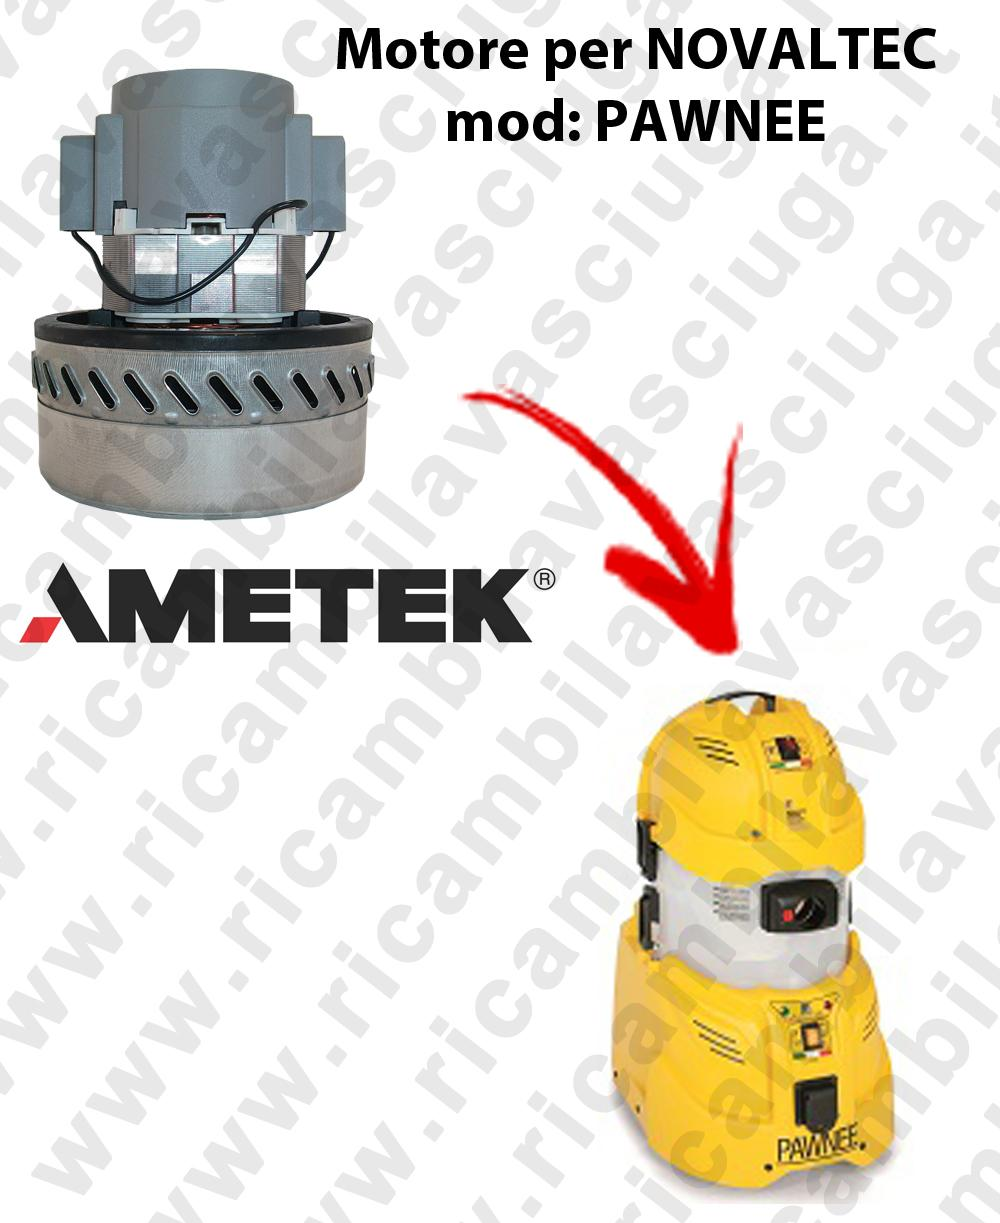 Motore aspirazione AMETEK per aspirapolvere PAWNEE NOVALTEC